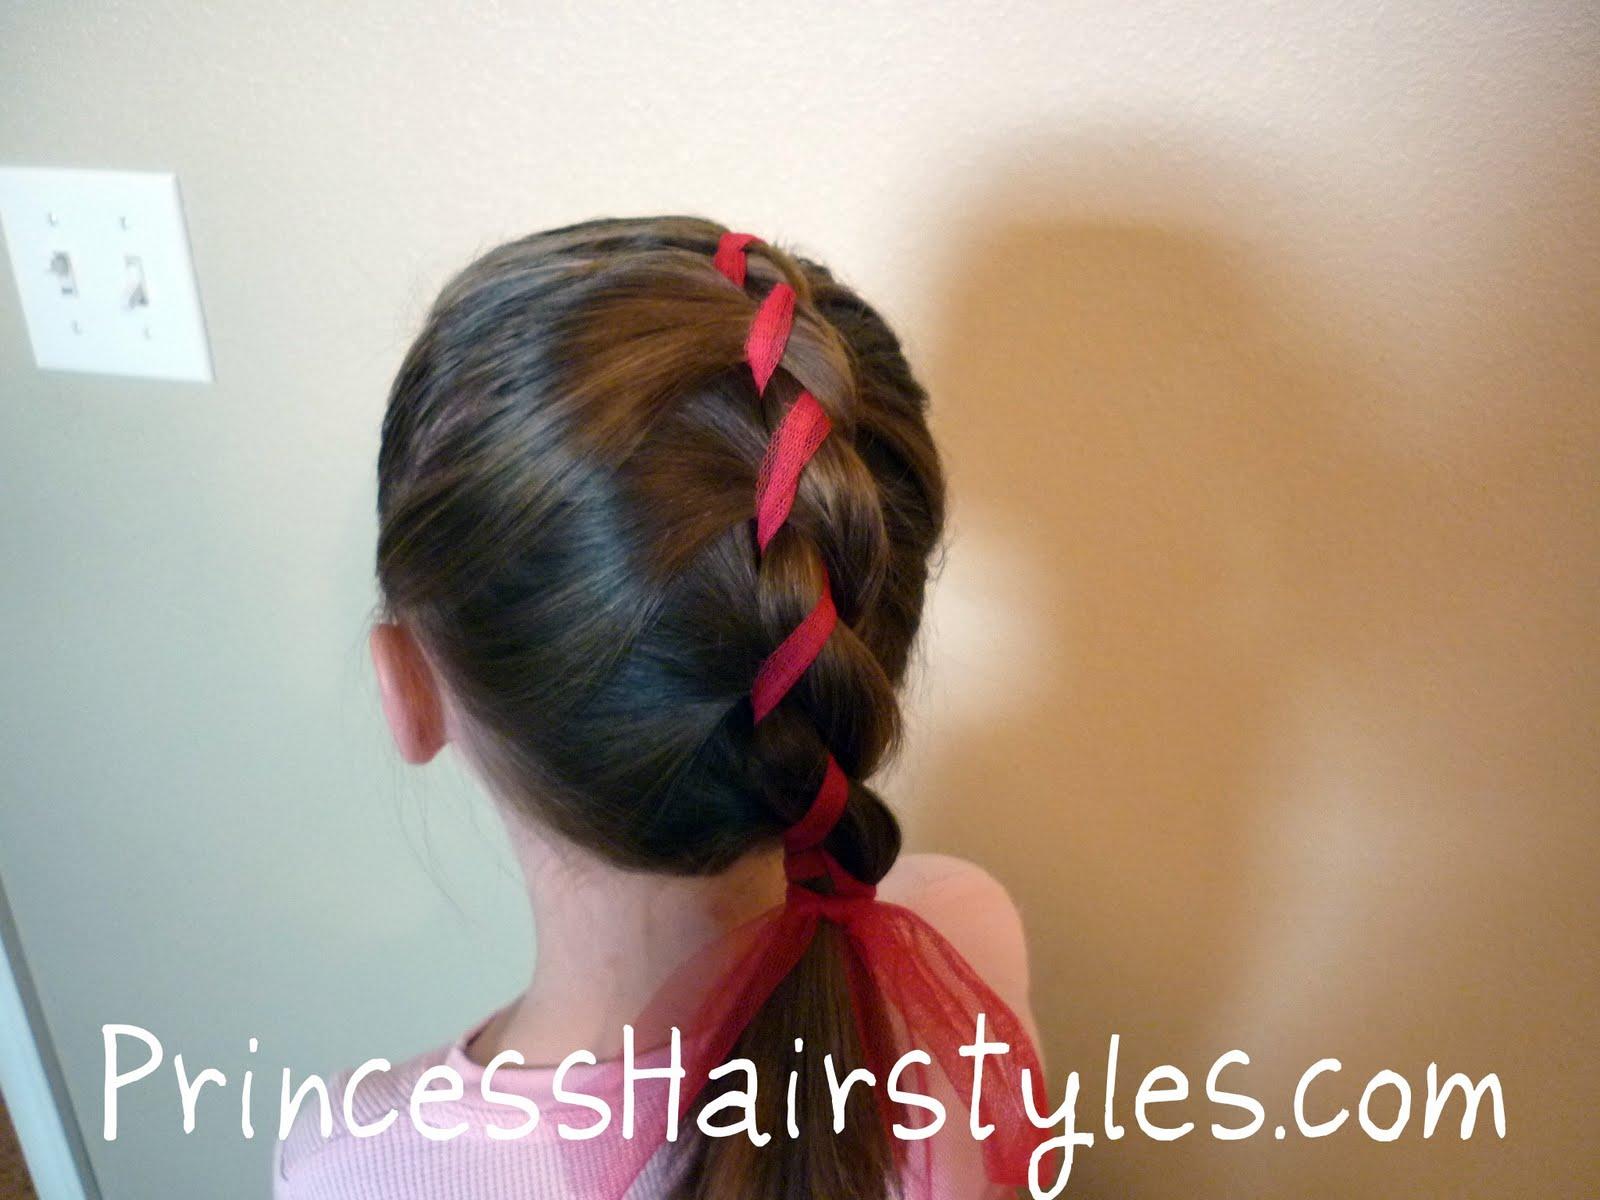 Peachy 2 Strand Ribbon French Braid Easy Hairstyles For Girls Short Hairstyles For Black Women Fulllsitofus